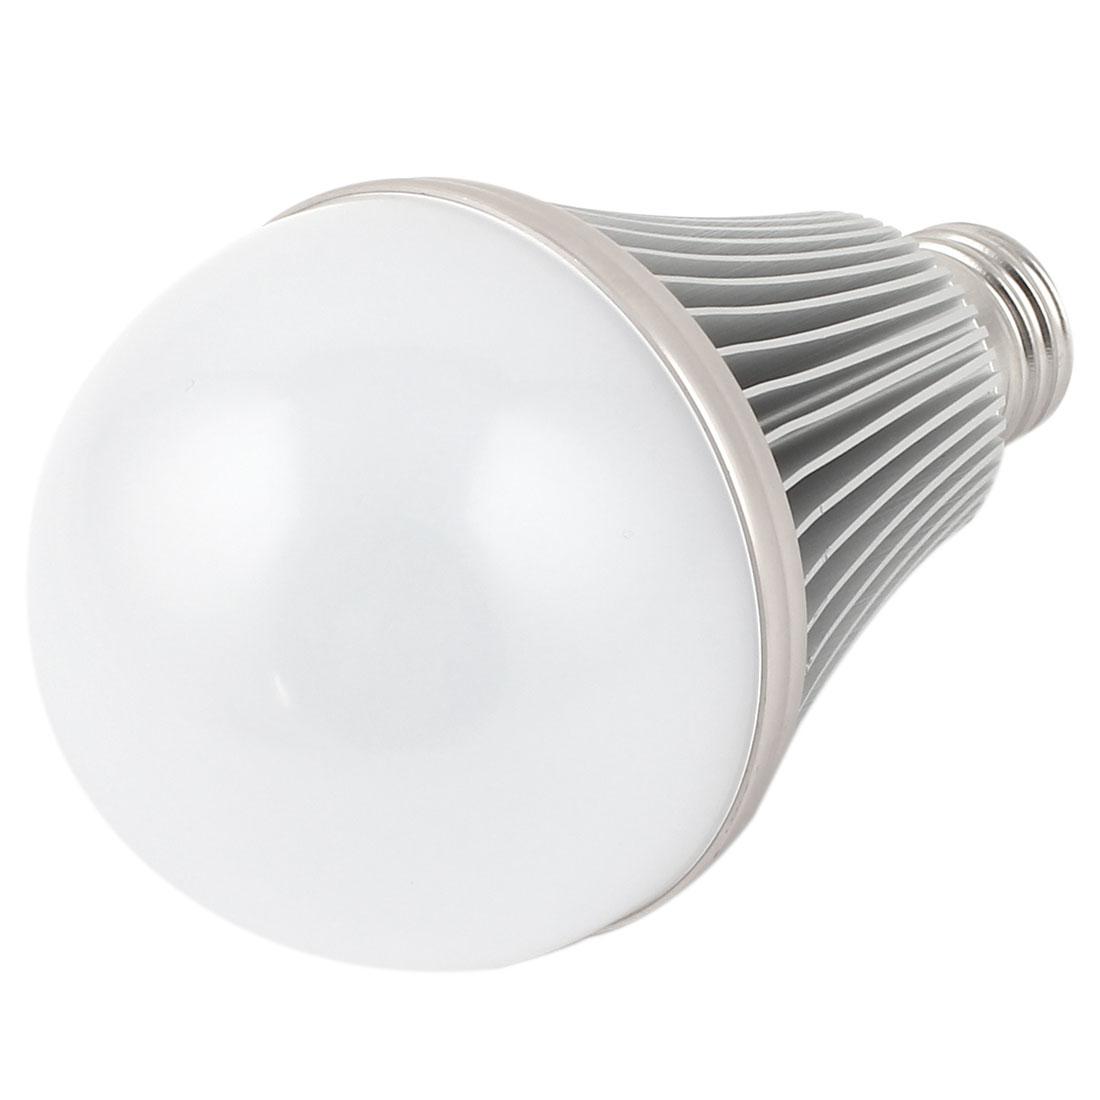 9W Silver Tone E27 75mm Dia Globe Ball Bulb Lamp Shell LED Aluminum Heatsink